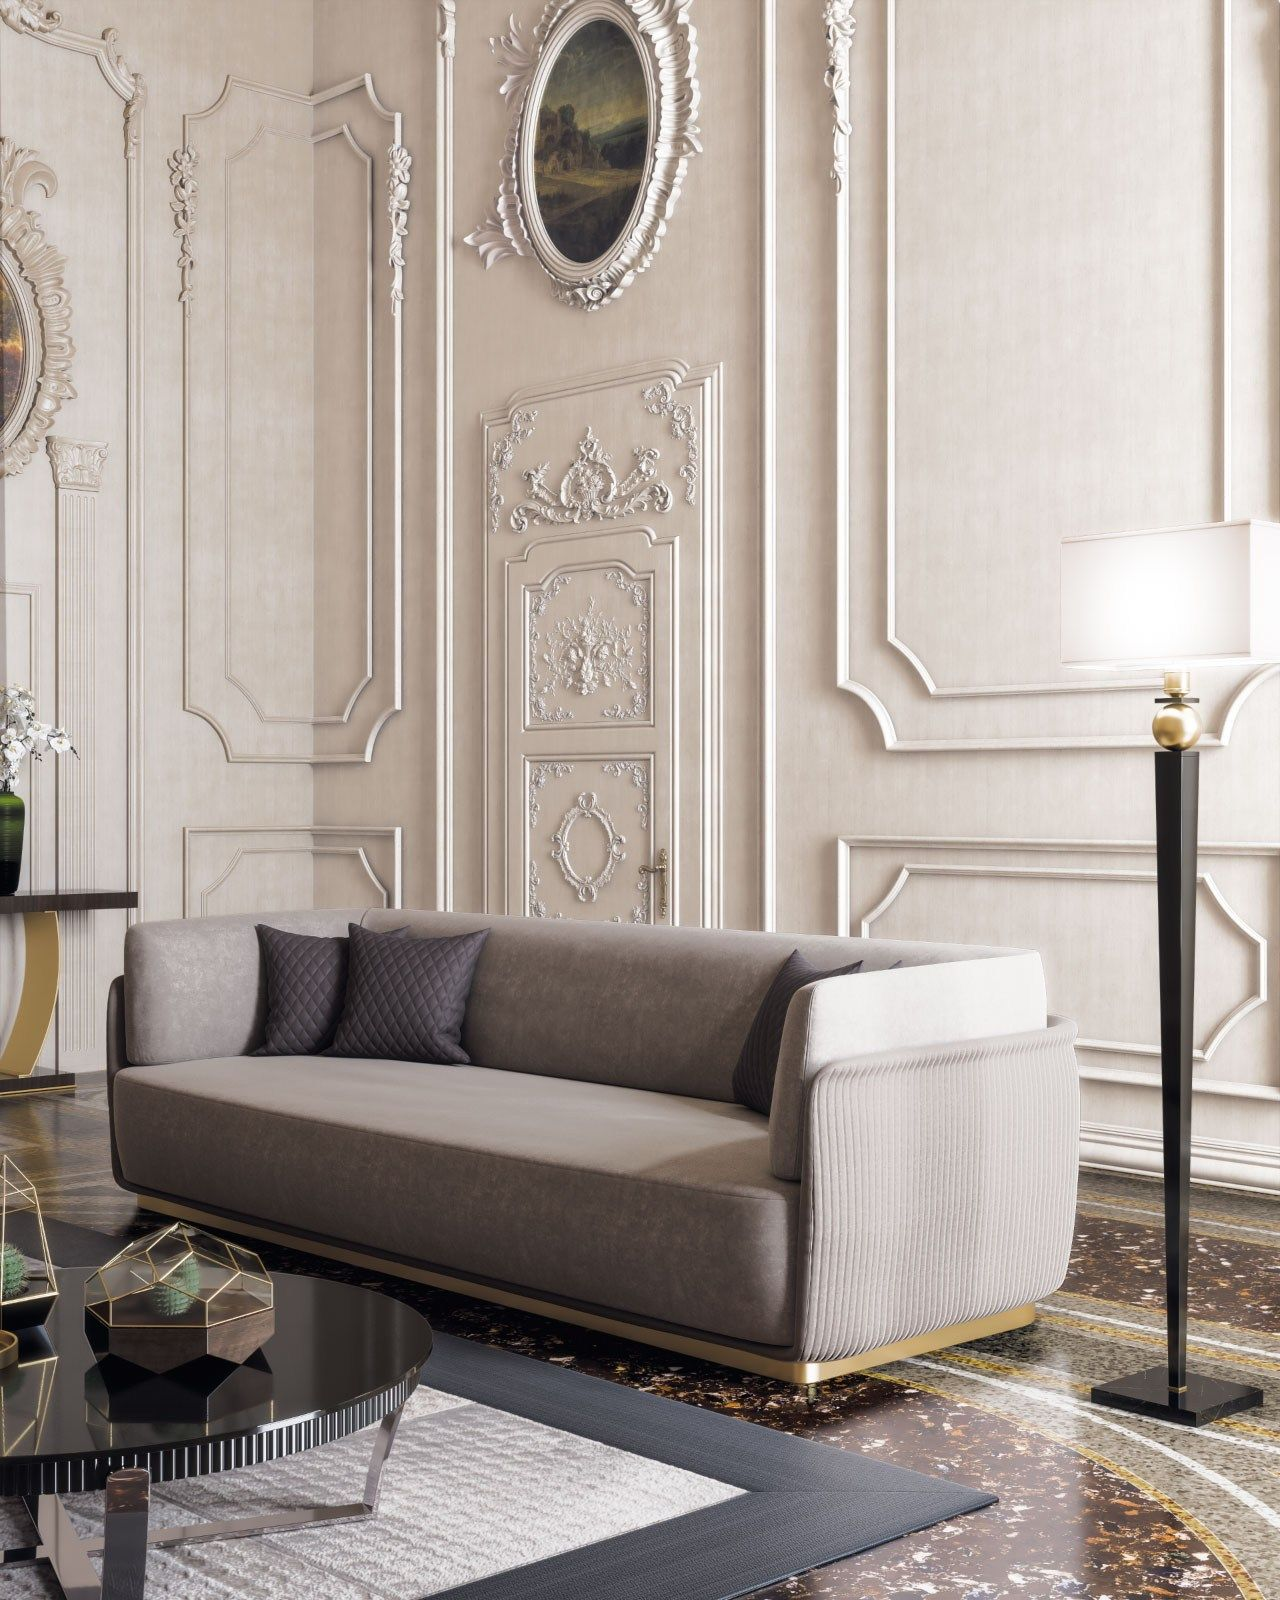 Allure Sofa By Capital Collection Fabric Sofa Allure